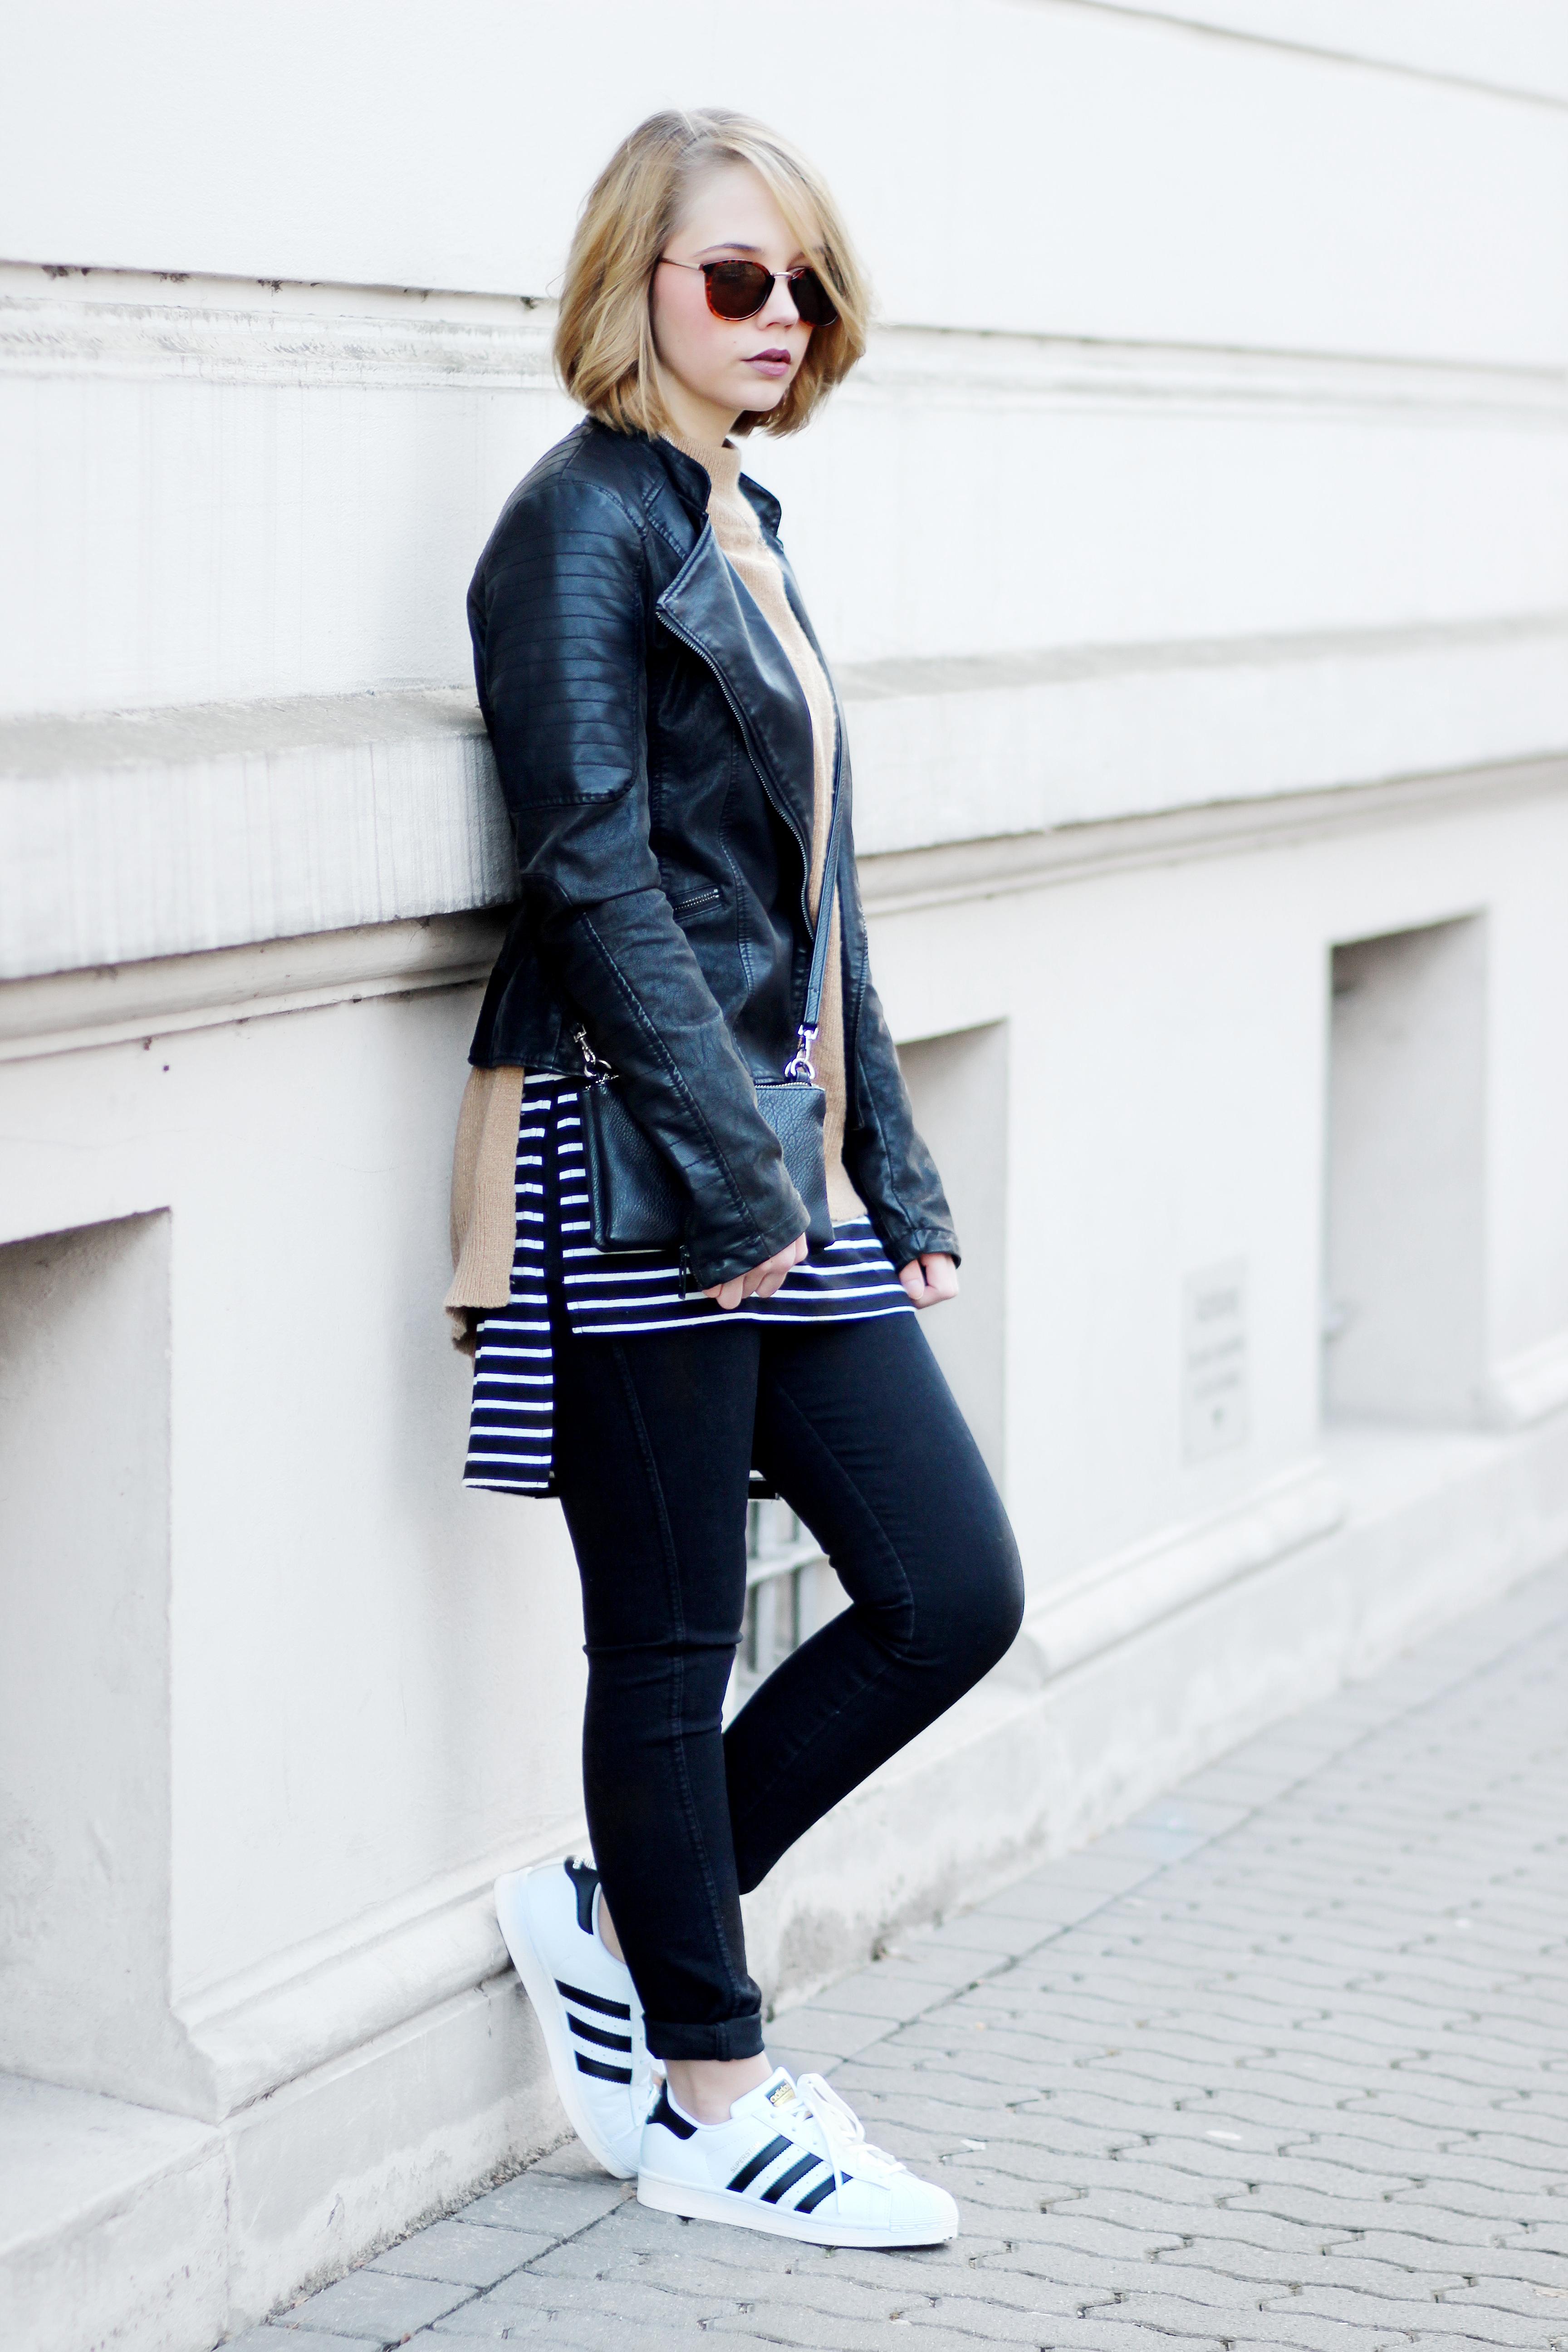 bezauberndenana-fashionblog-layering-outfit-lederjacke-reserved-lagenlook-rollkragenpullover-streifen-shirt-adidas-superstars-streestyle-casual (9)